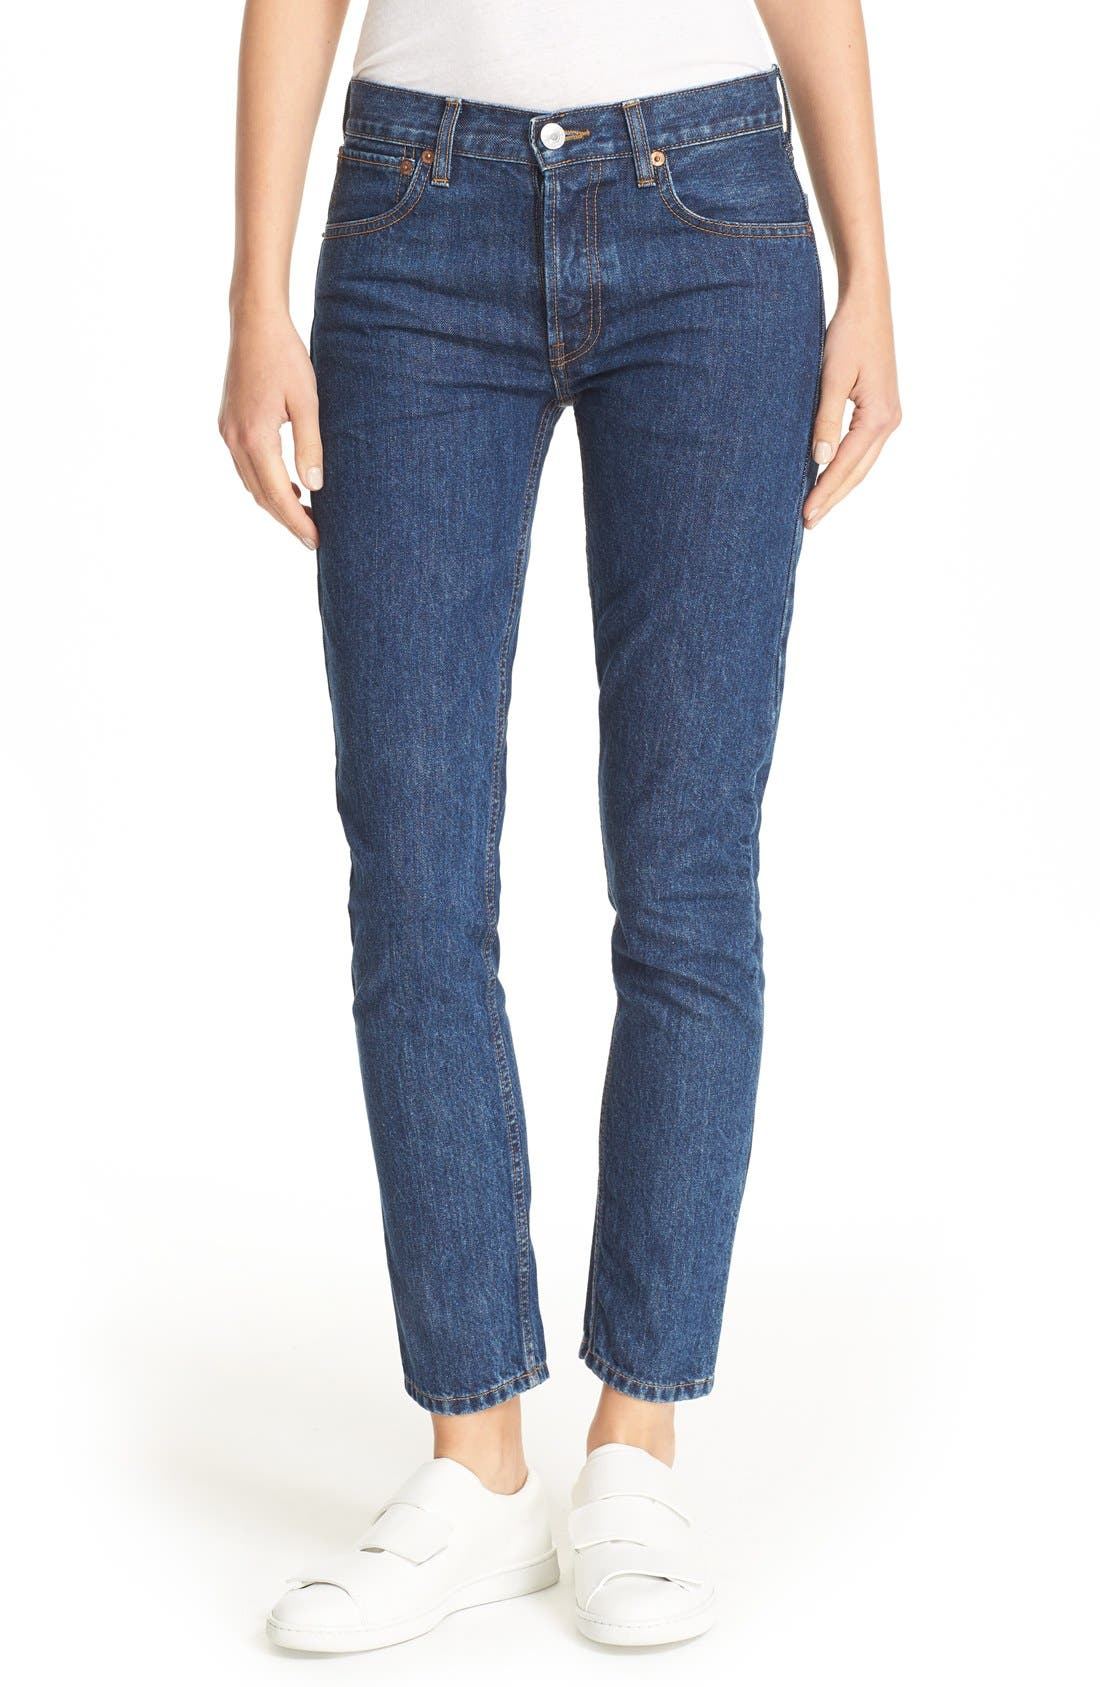 Alternate Image 1 Selected - Re/Done 'Originals' Skinny Jeans